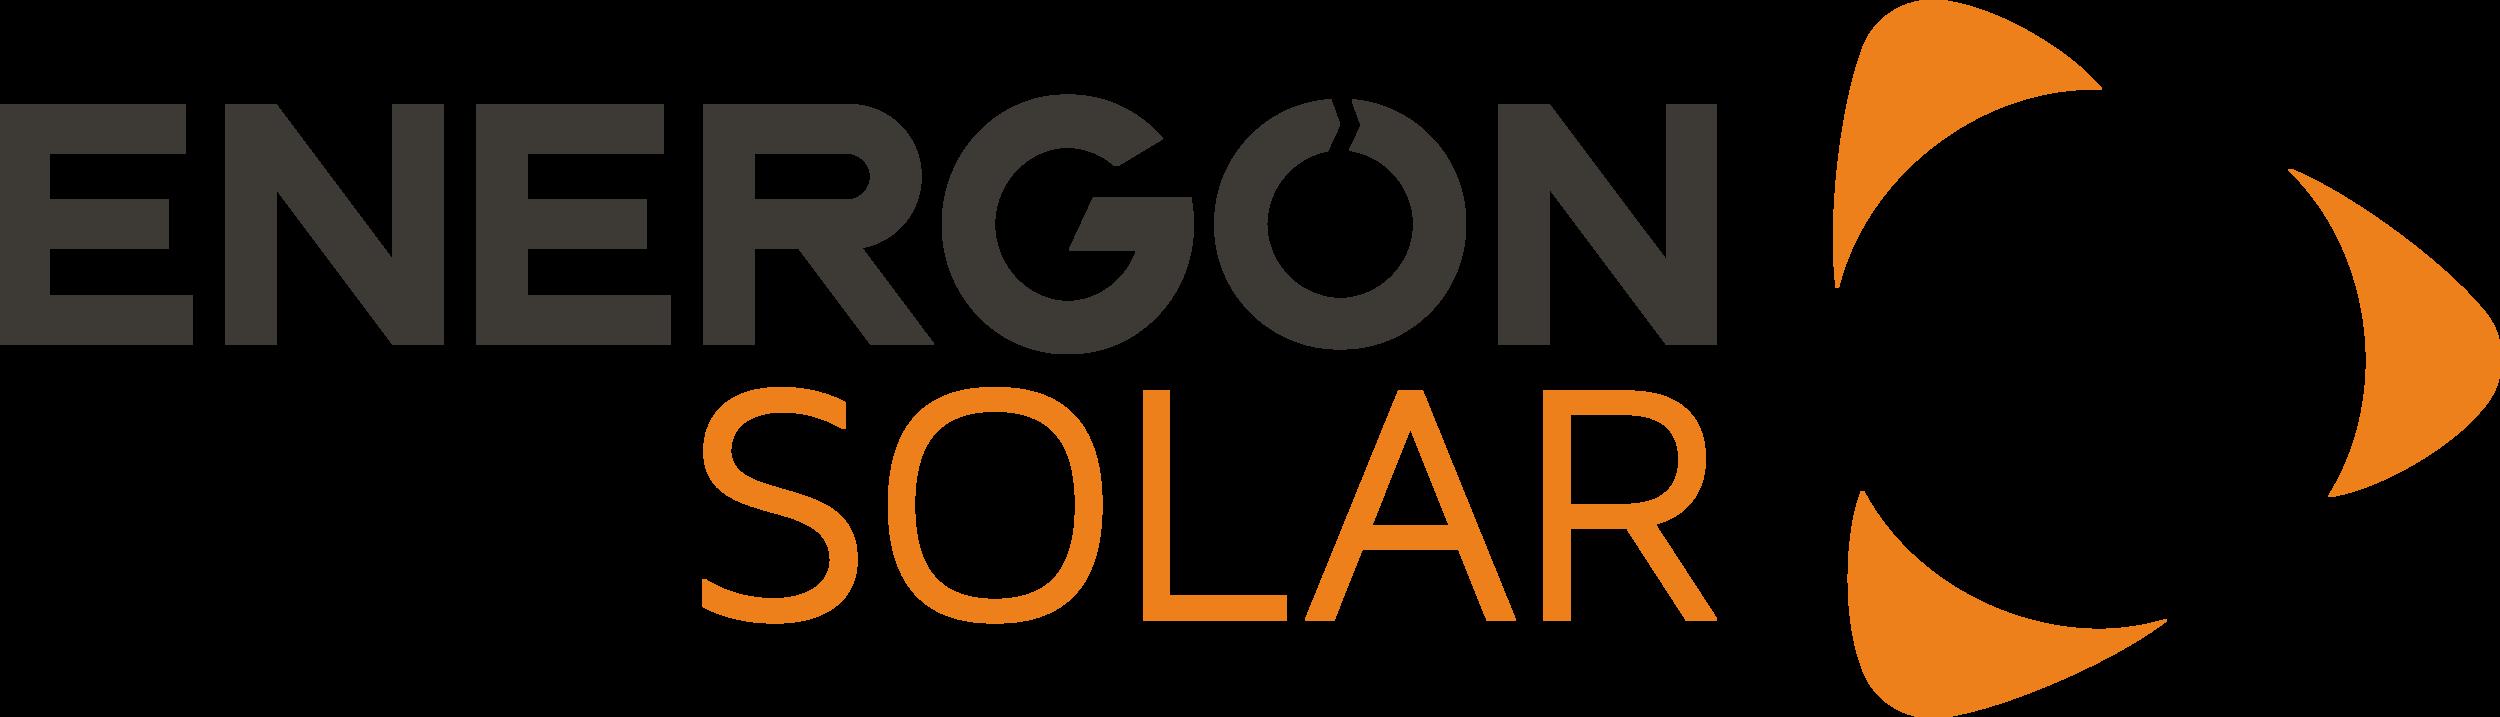 LOGO ENERGON SOLAR.png